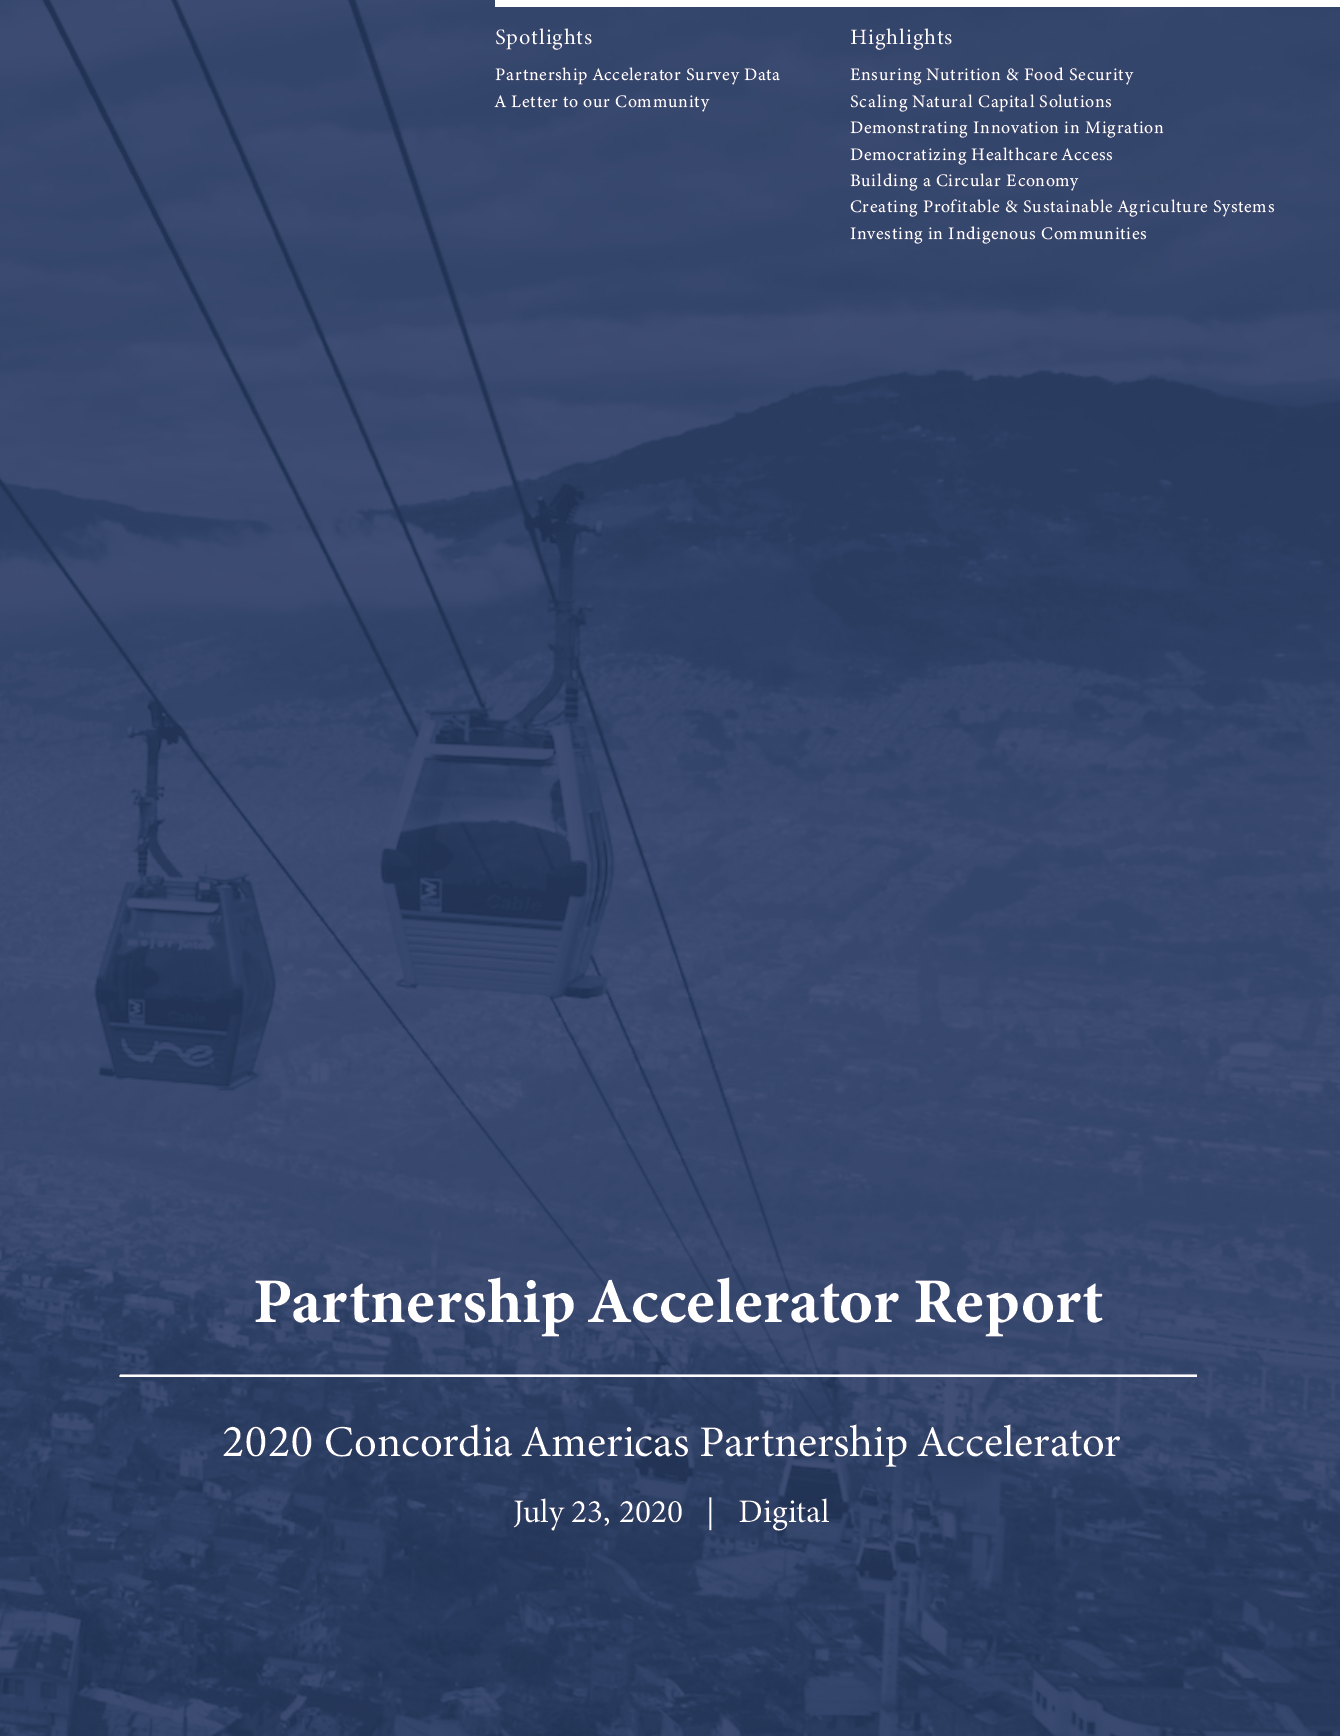 Screen Shot 2020 08 31 at 2.33.49 PM - 2020 Concordia Americas Partnership Accelerator Report